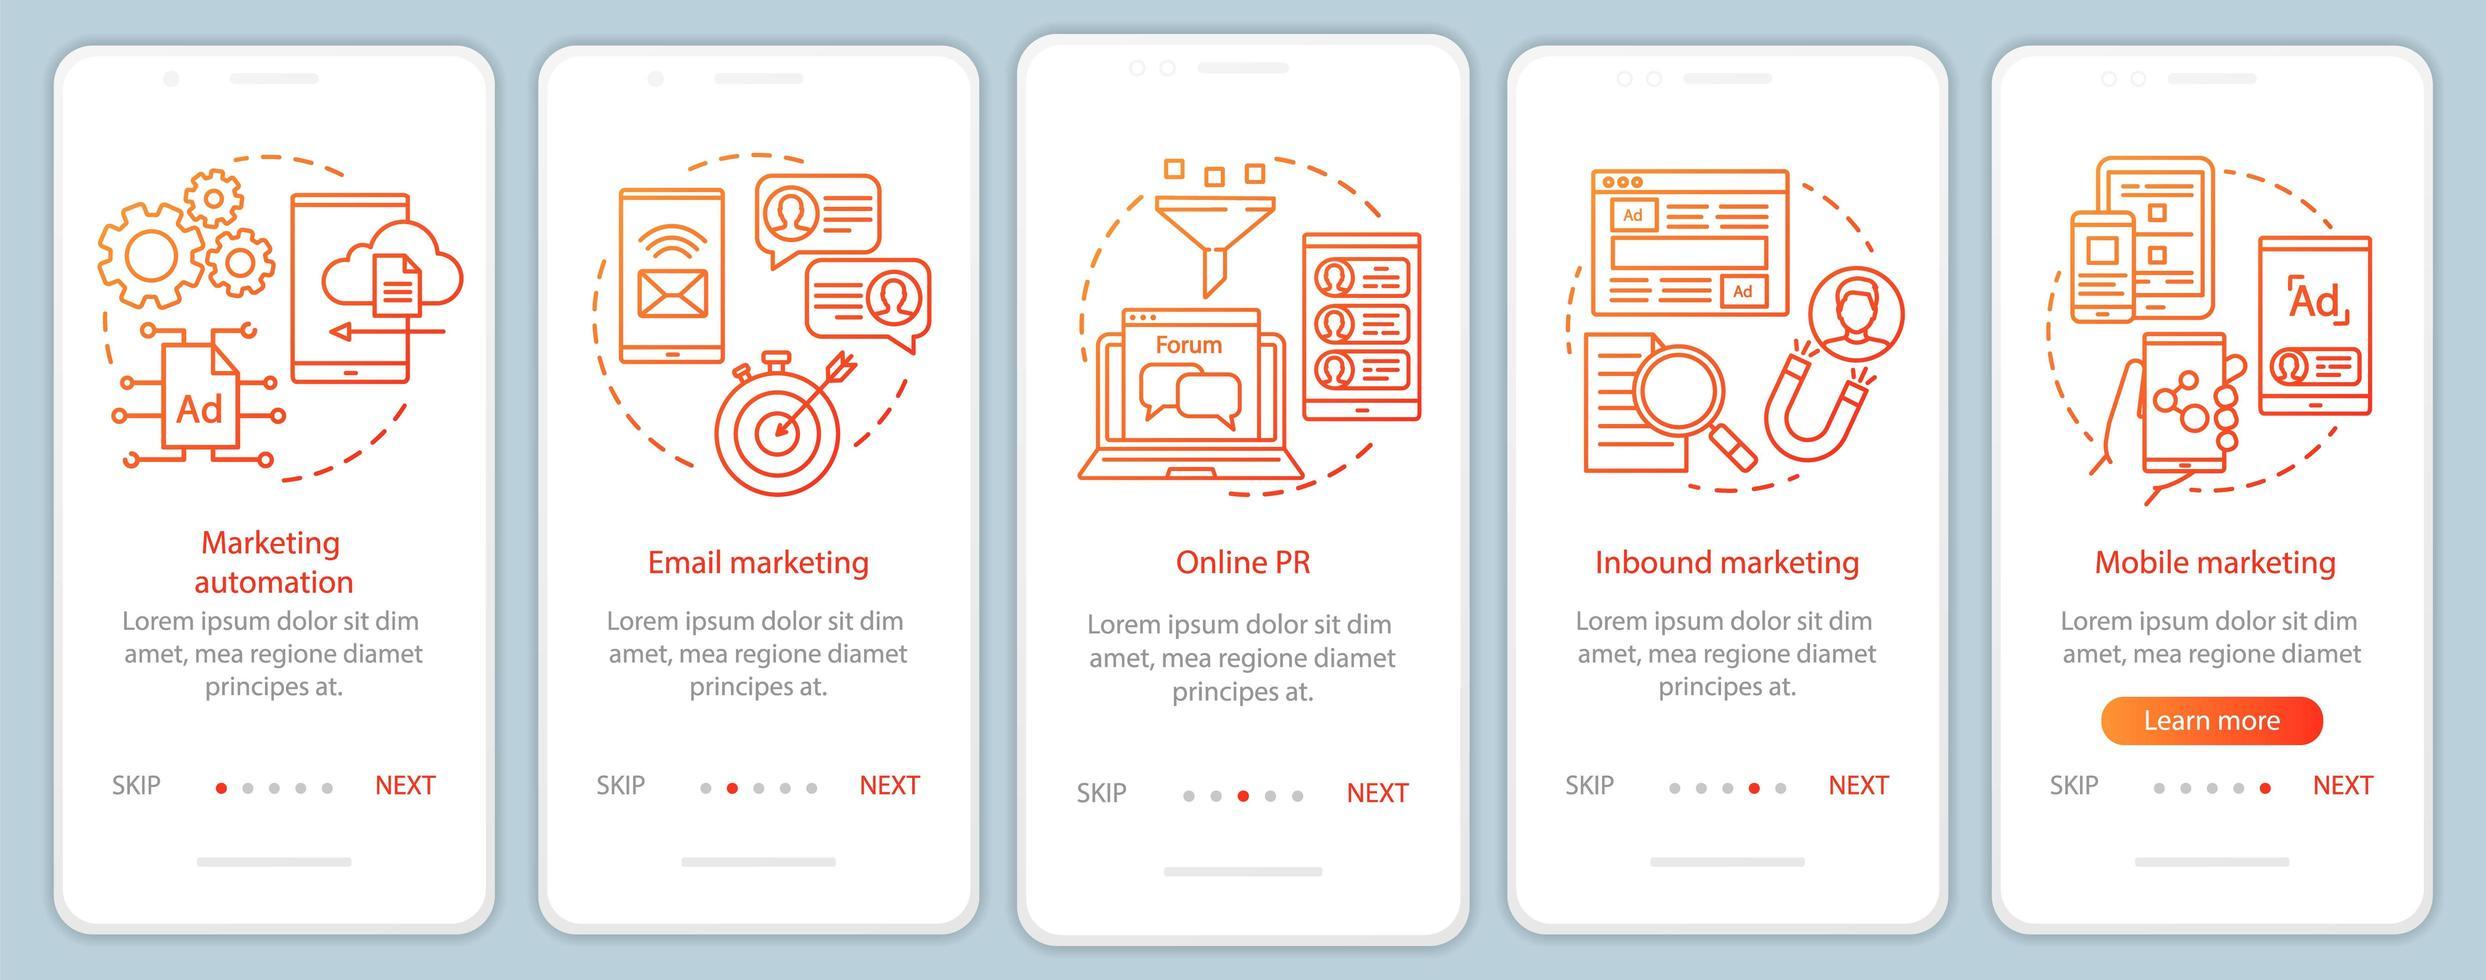 Orange Onboarding-Bildschirme für digitale Marketingtaktiken vektor